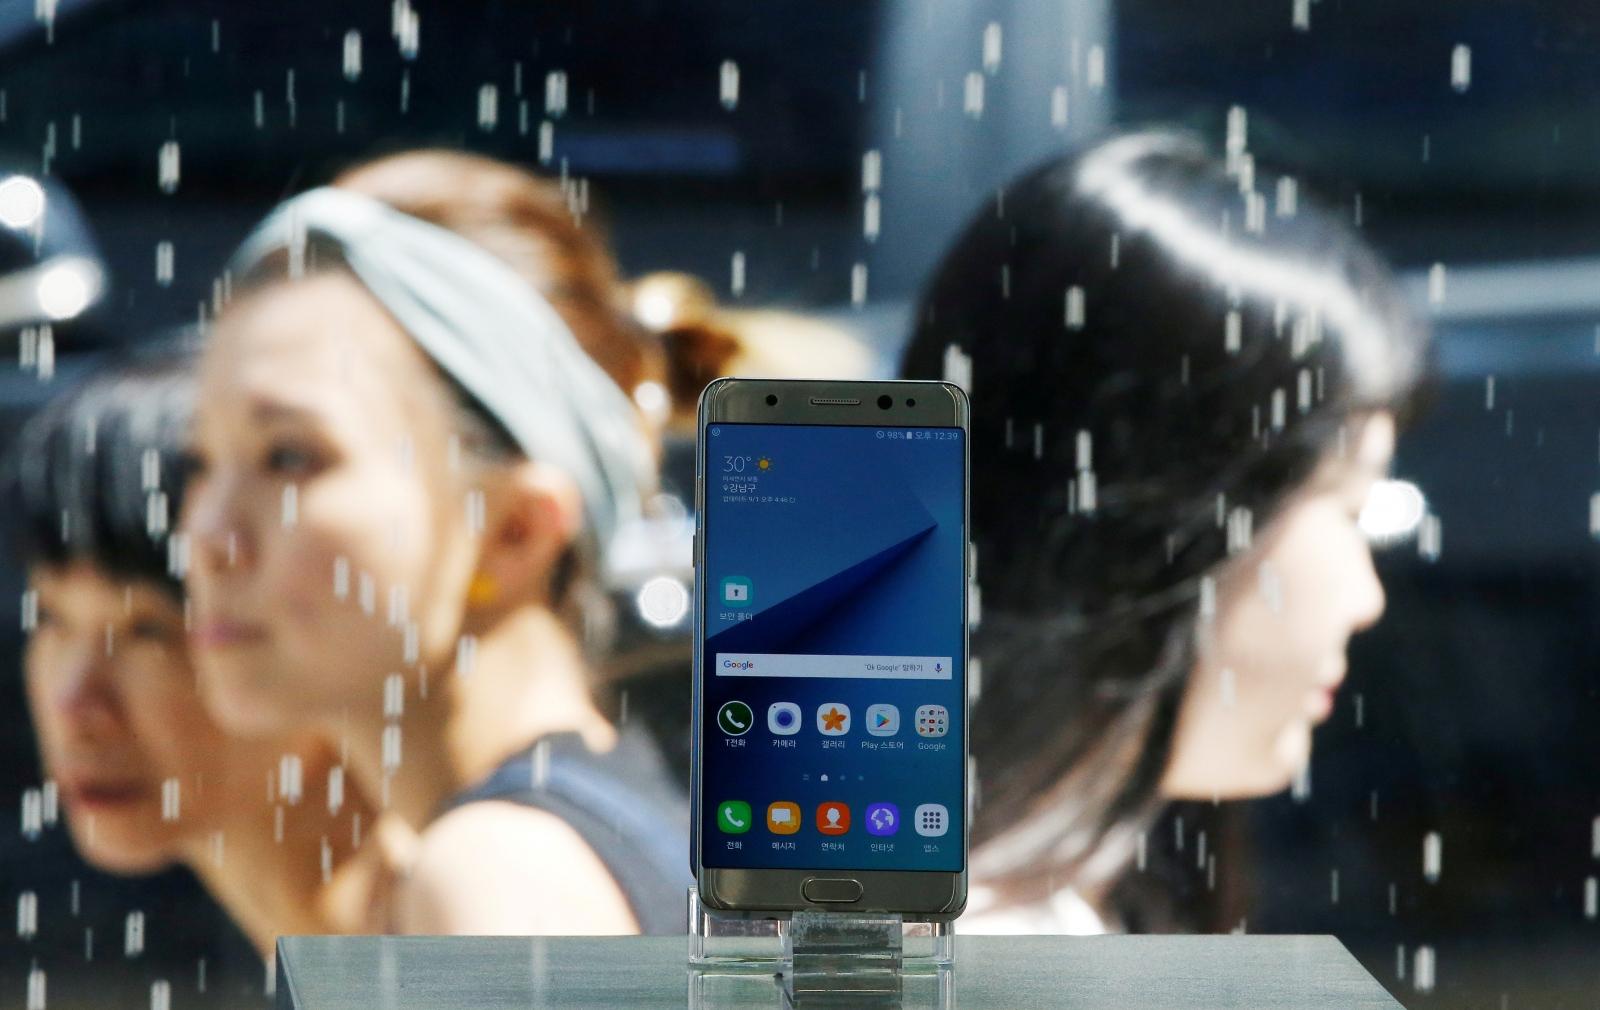 Samsung to resume Galaxy Note 7 sales